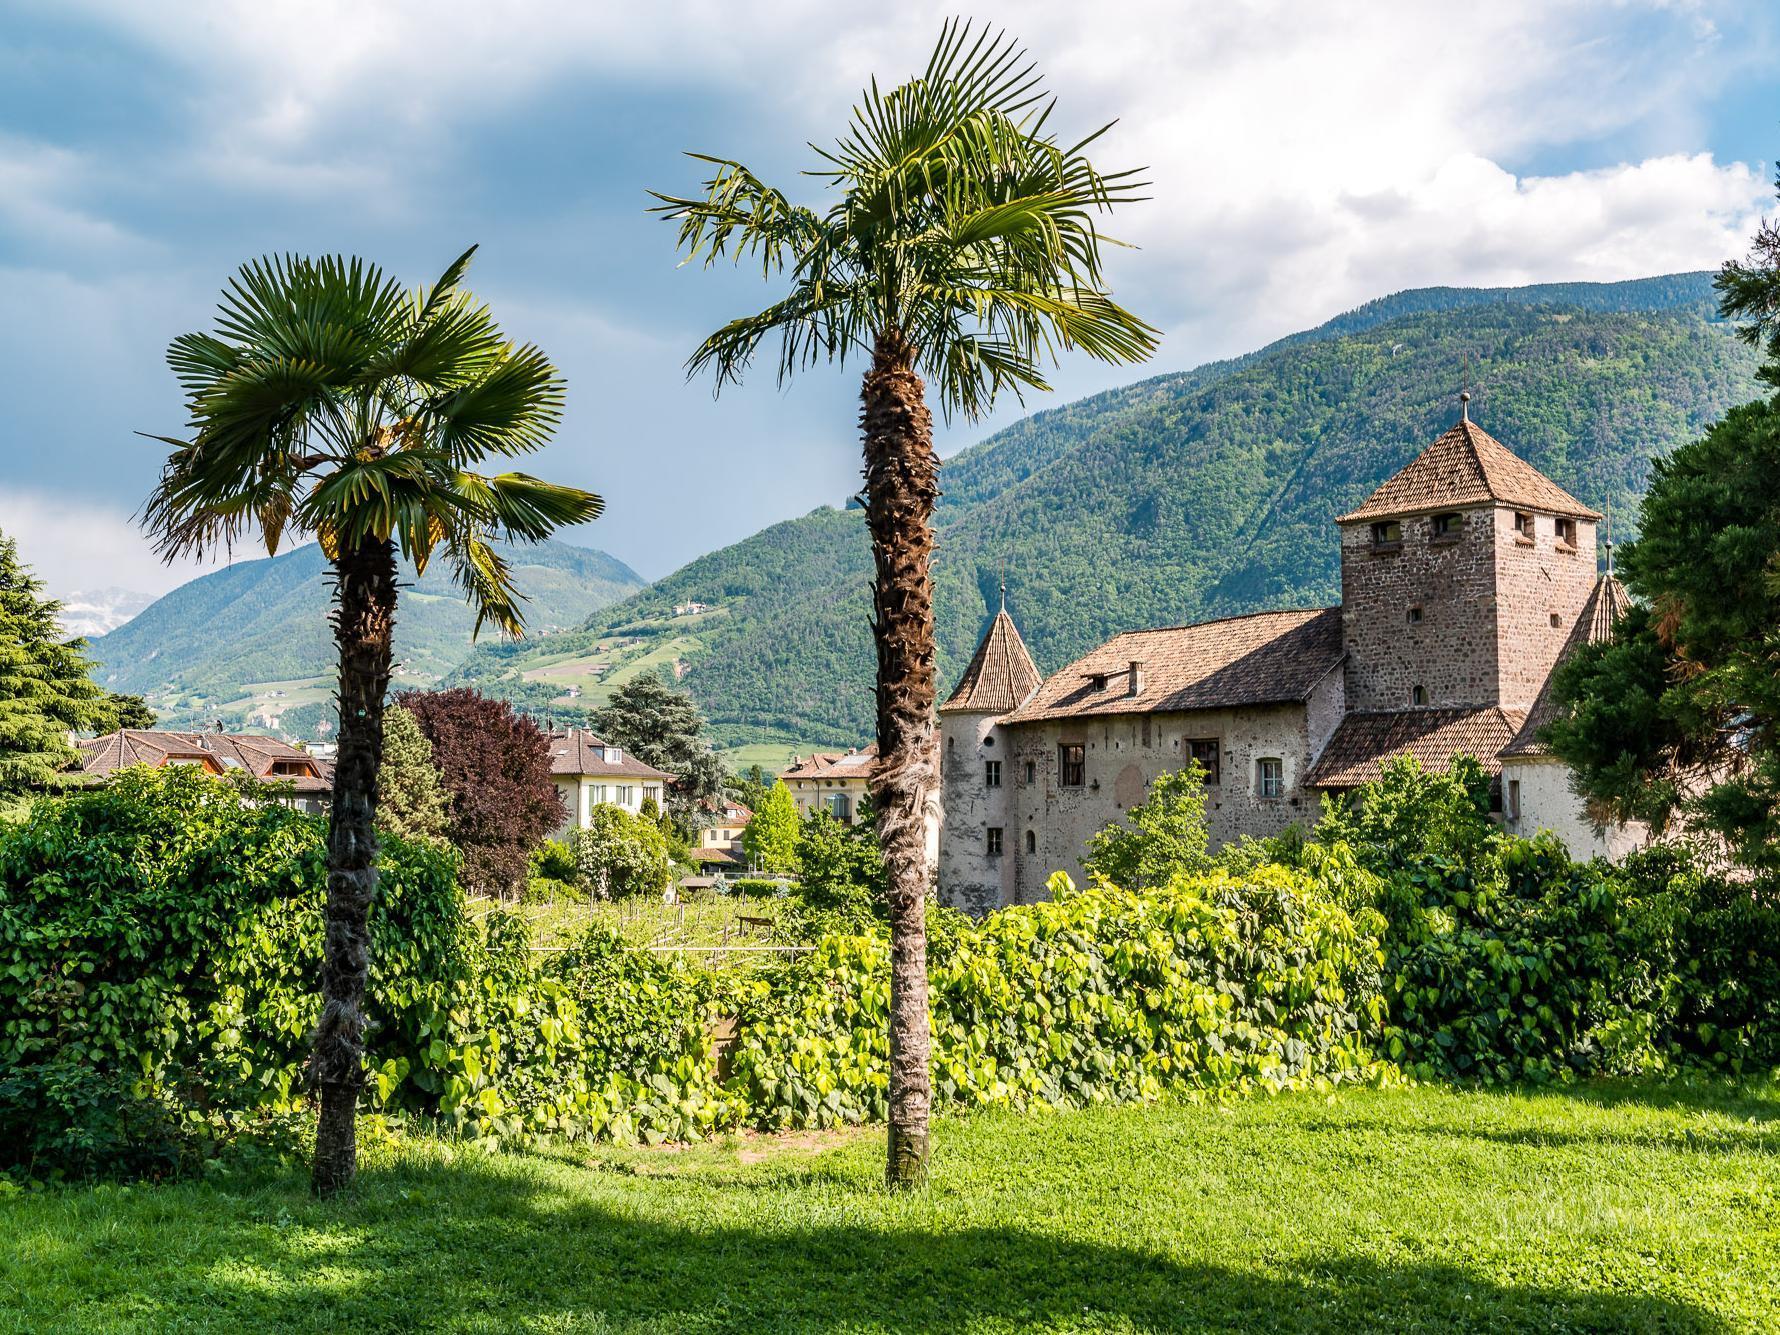 © Südtirols Süden/Achim Meurer